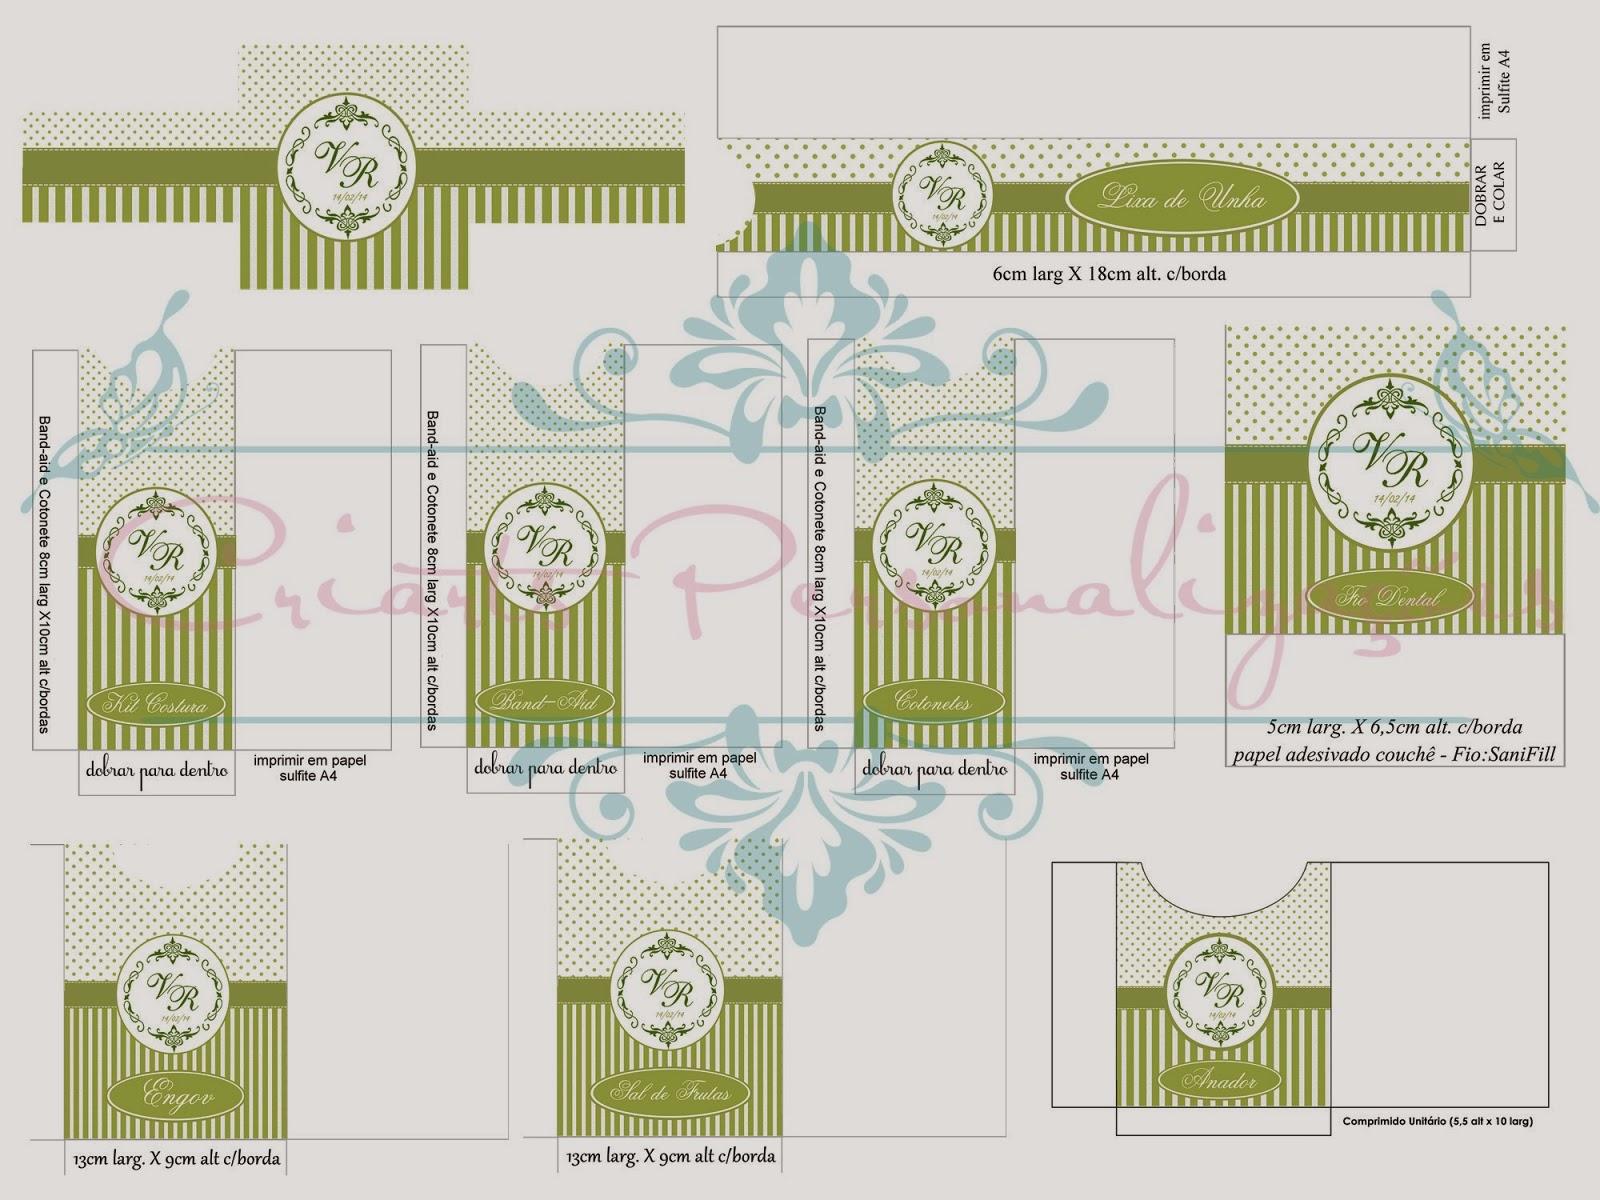 Criarts Personalizacoes Kit Para Banheiro Verde